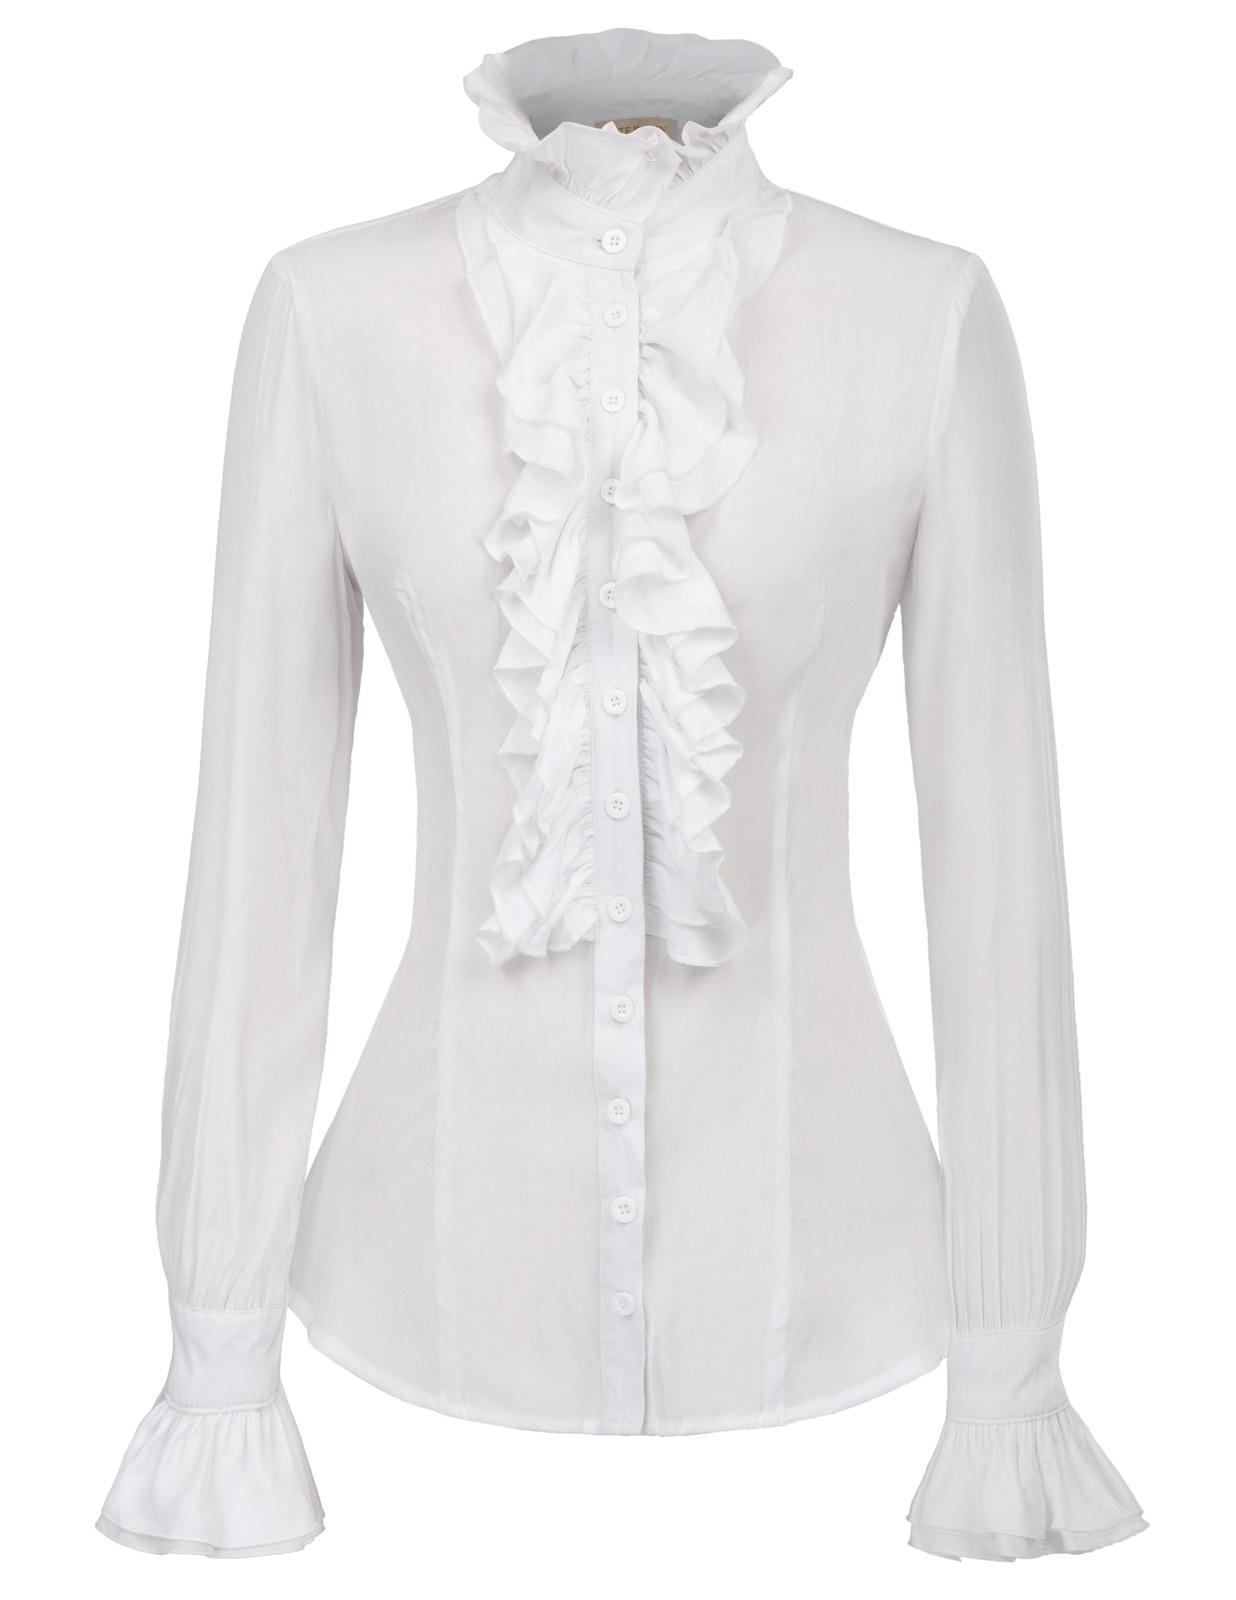 Autumn Winter   Blouse   White Vintage Retro Victorian Style Long Sleeve Ruffled   Blouse     Shirt   Tops Female